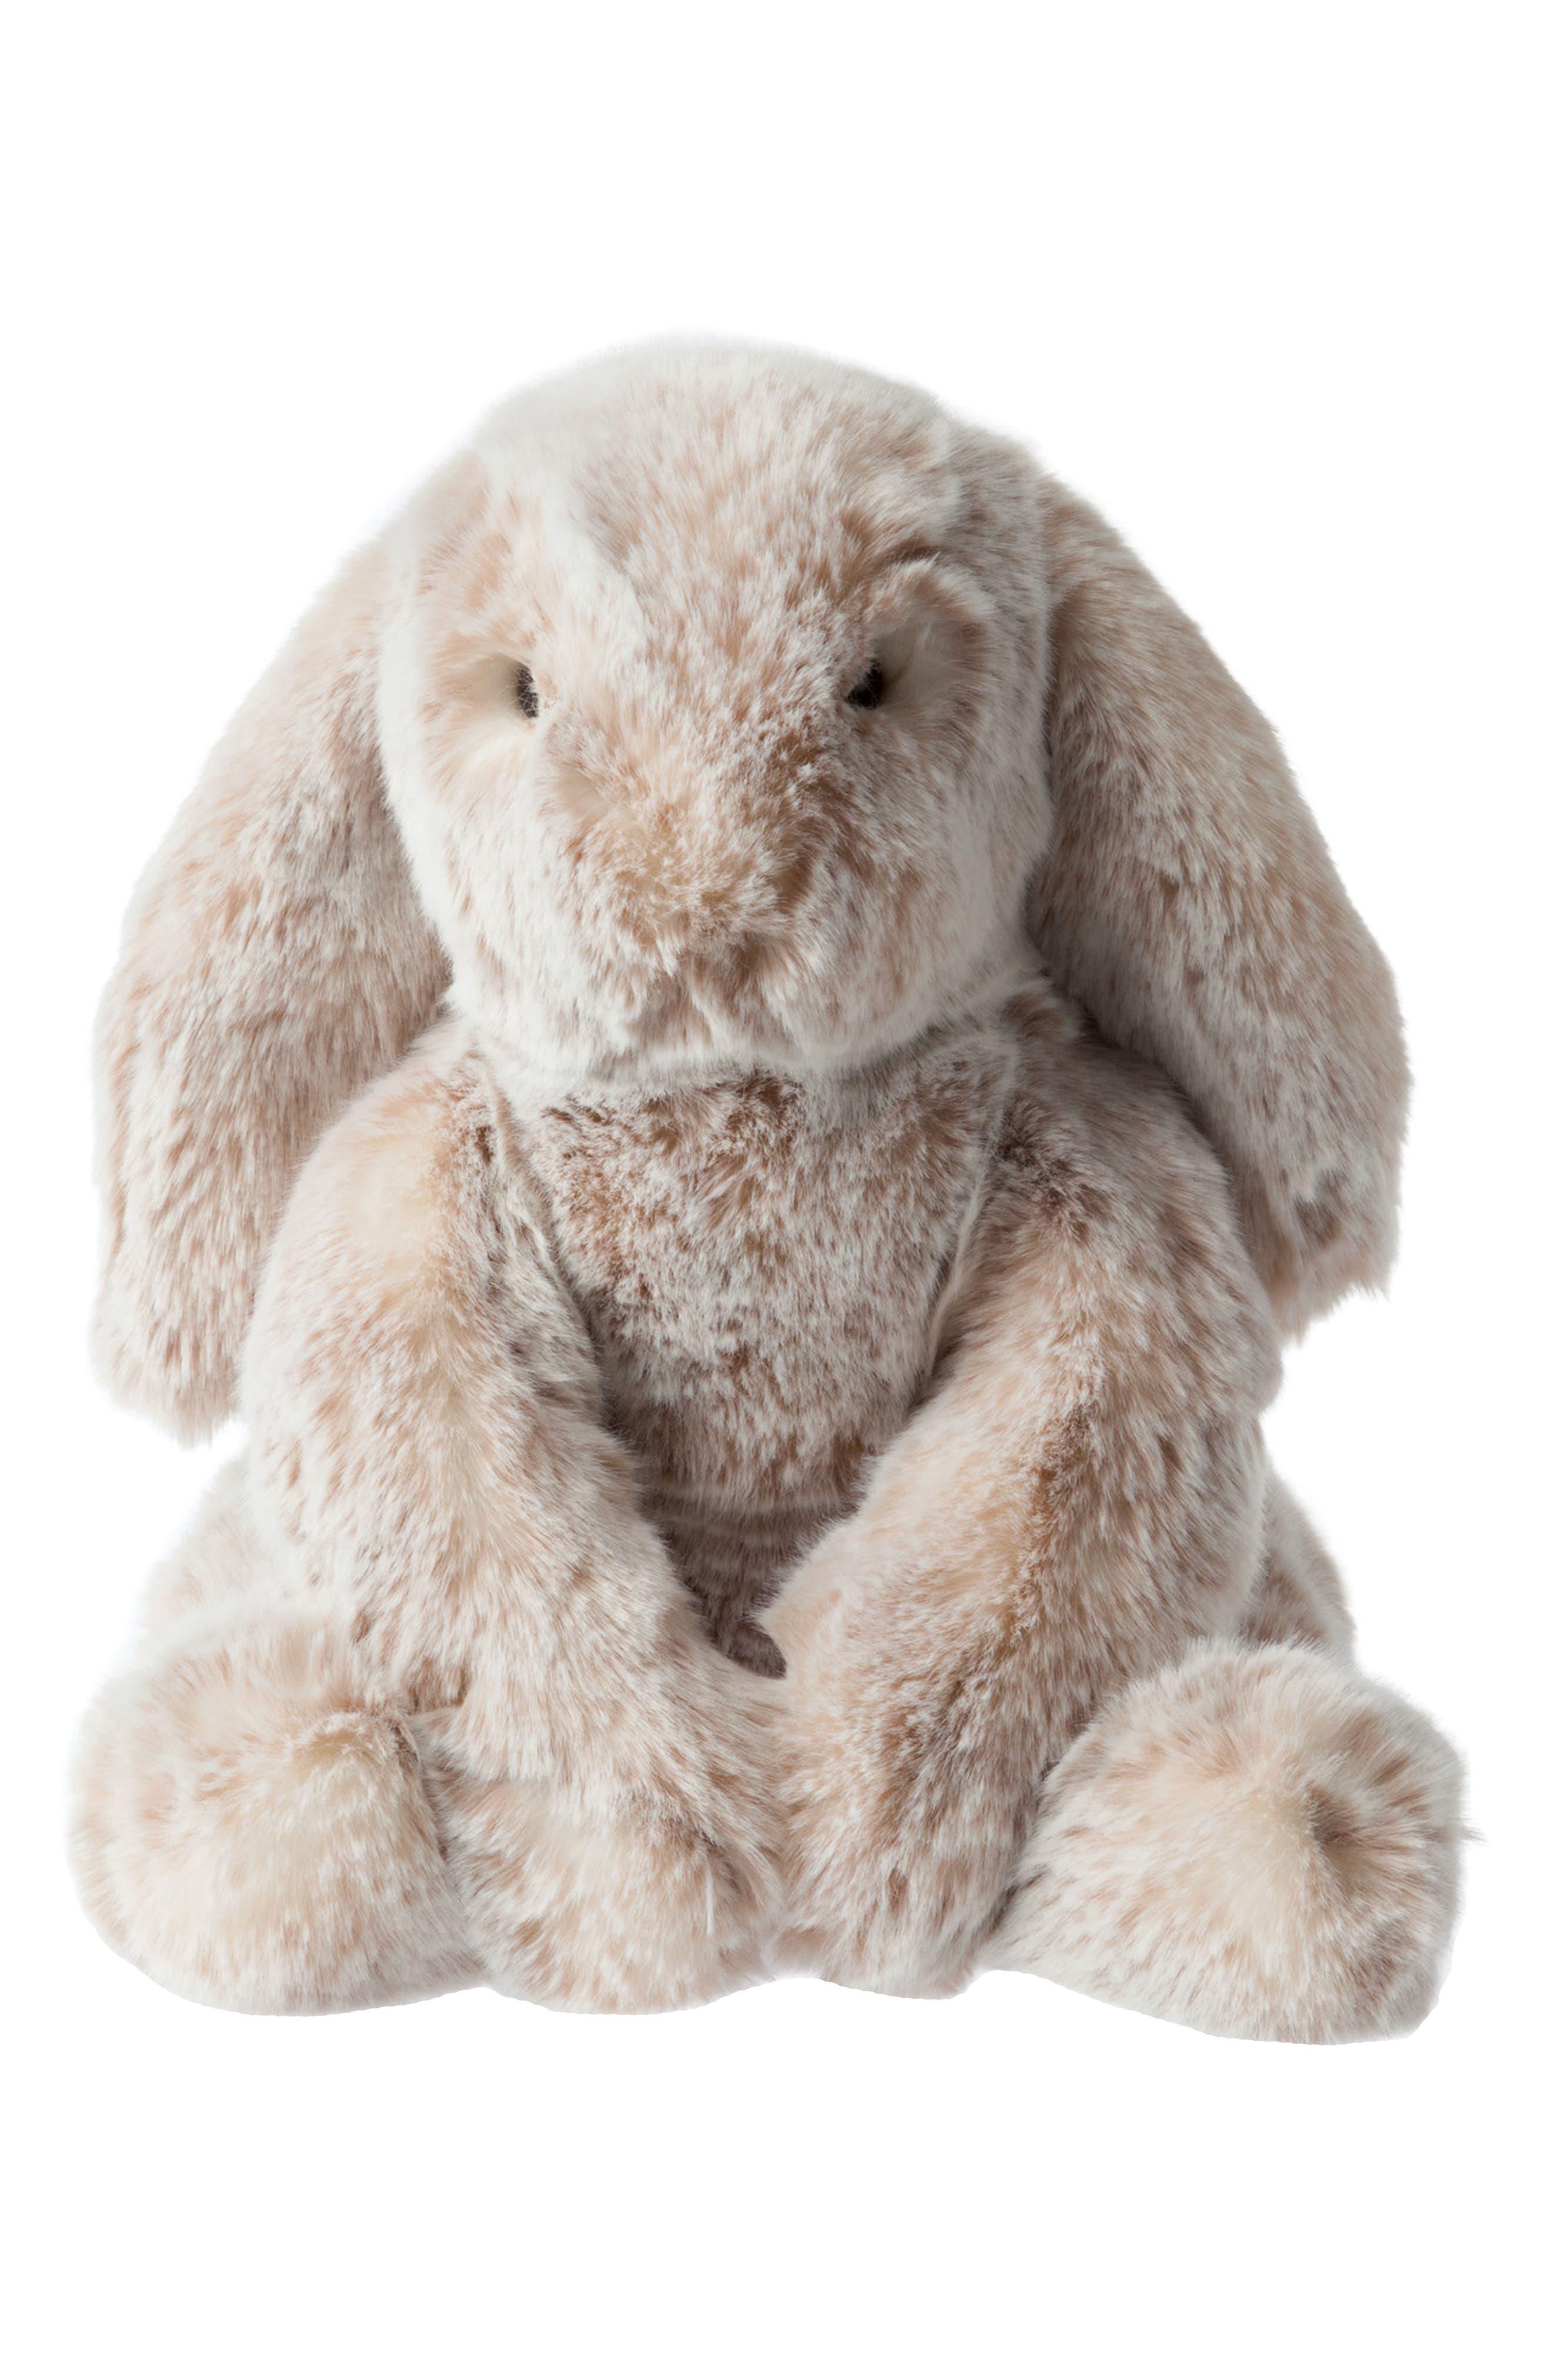 Luxe Bunny Stuffed Animal,                             Main thumbnail 1, color,                             200